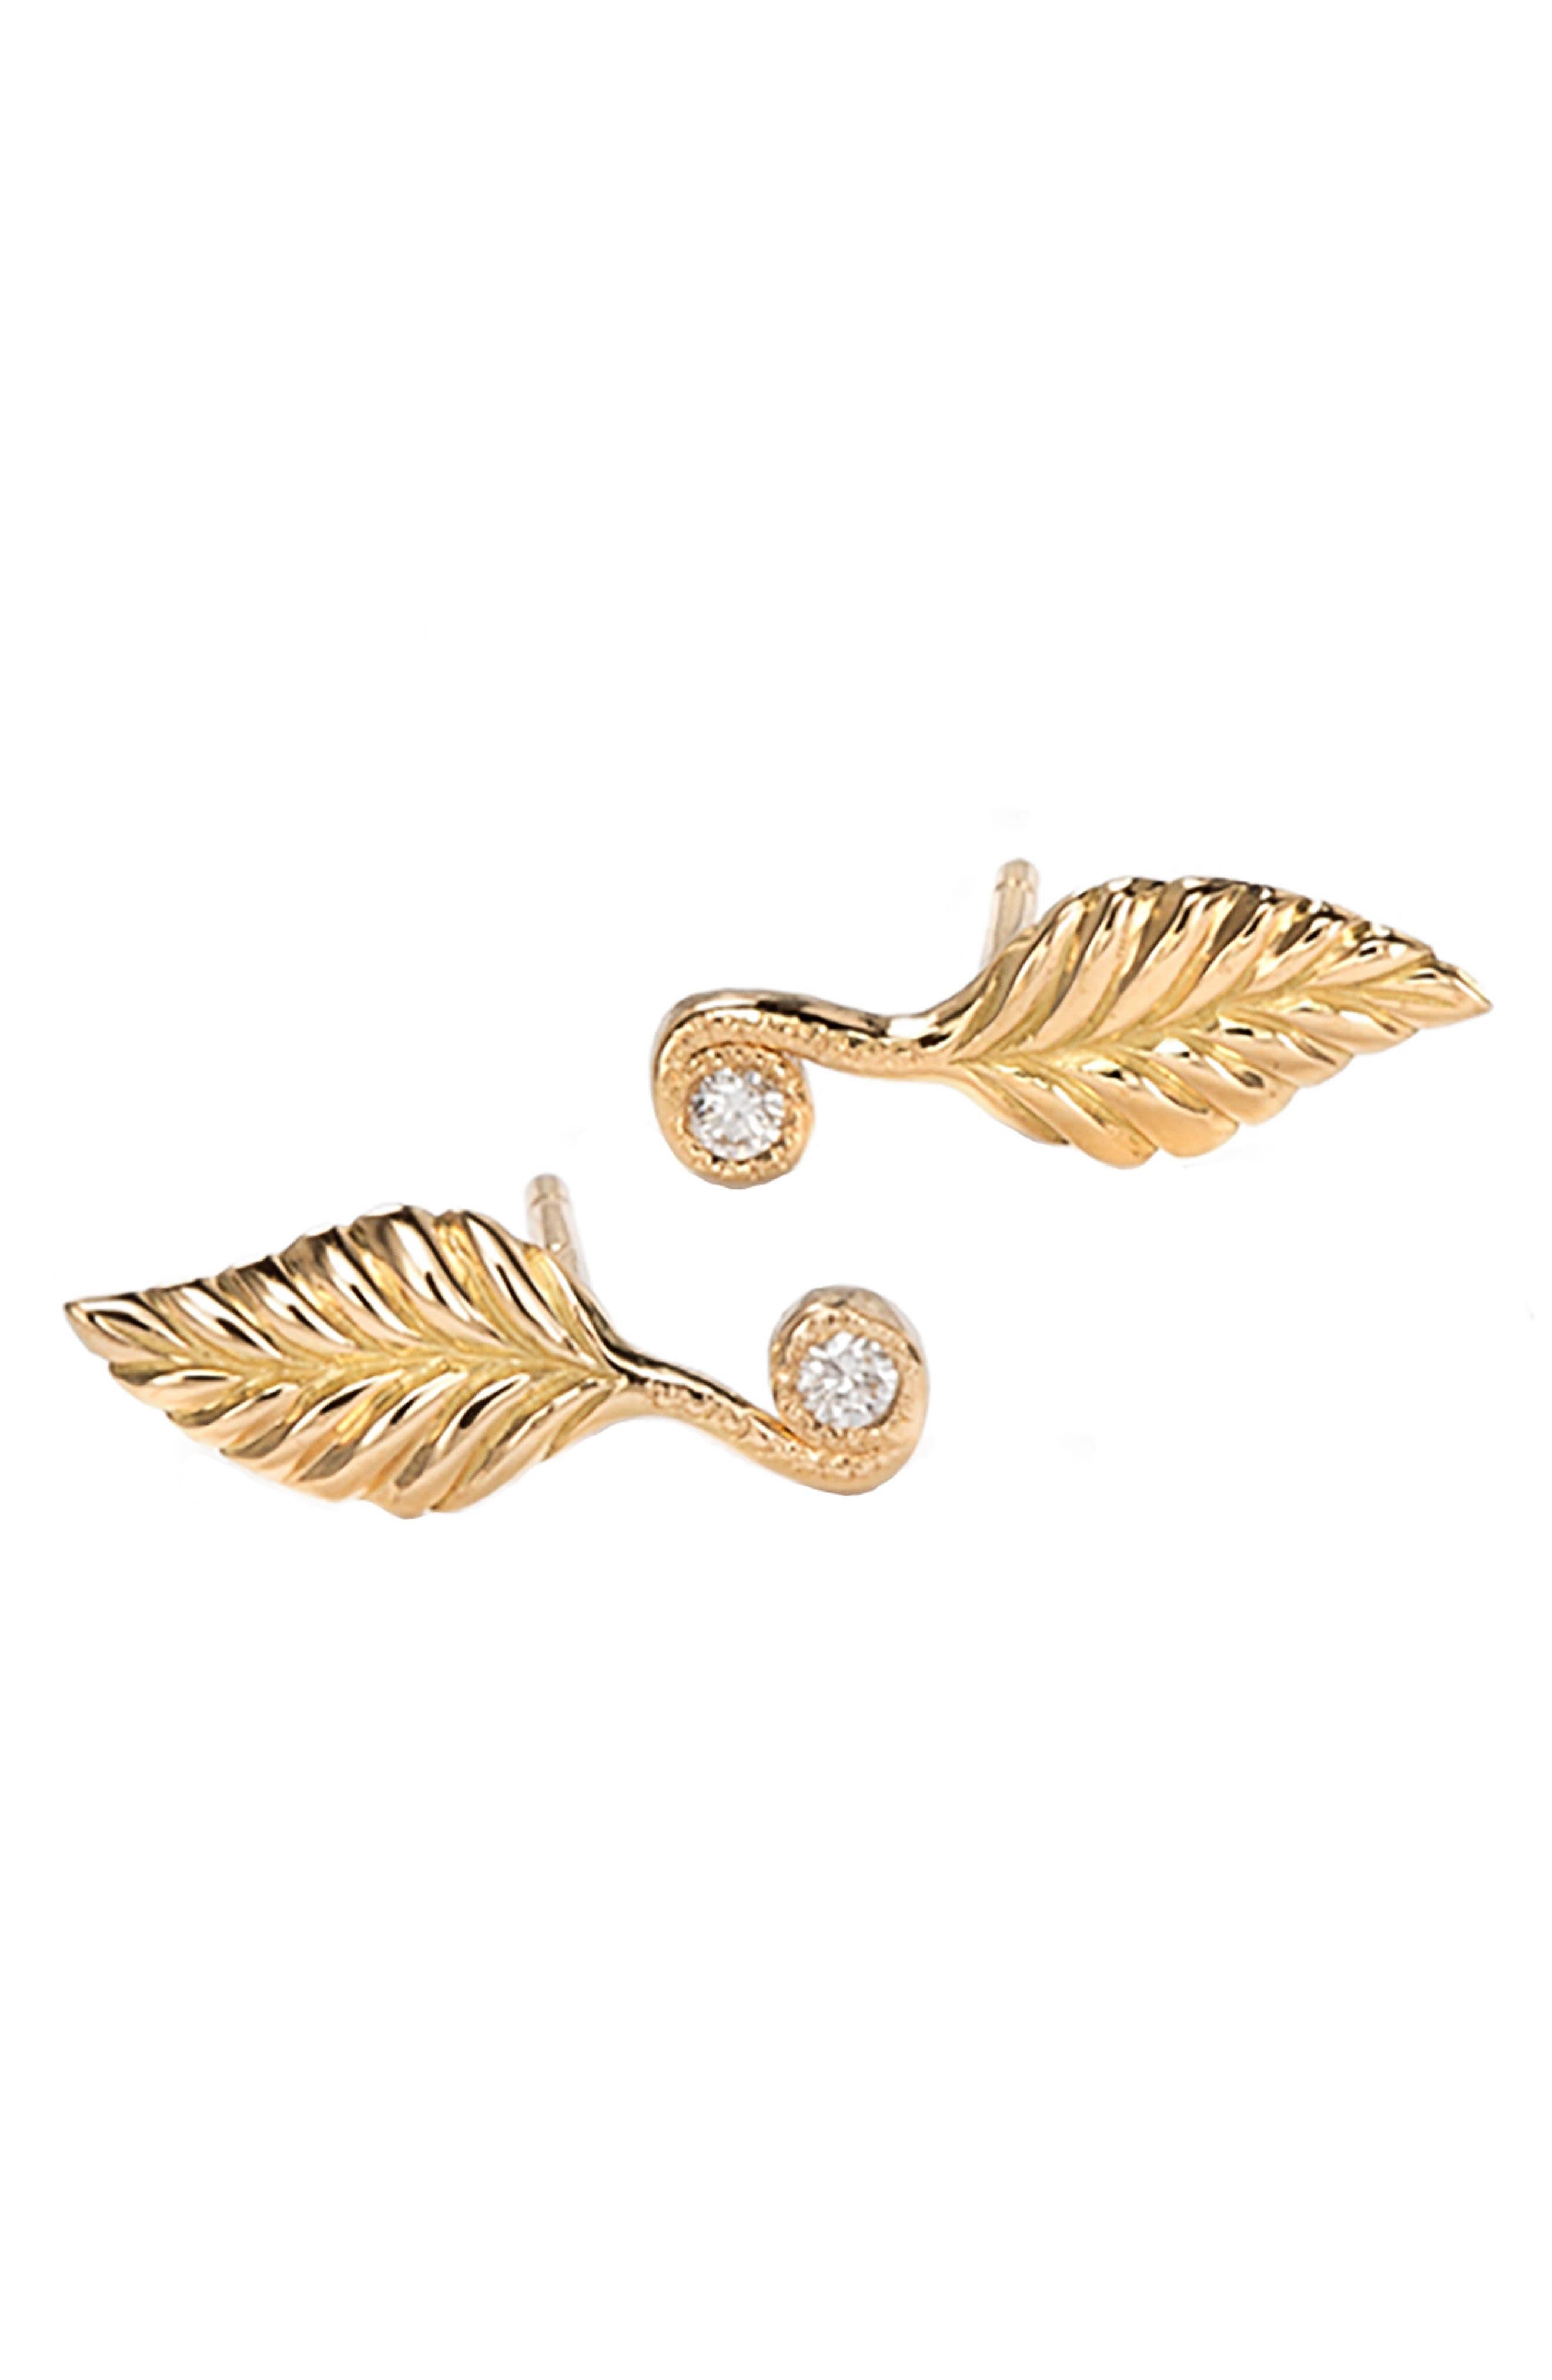 Diamond Rose Leaf Stud Earrlings,                             Main thumbnail 1, color,                             Yellow Gold